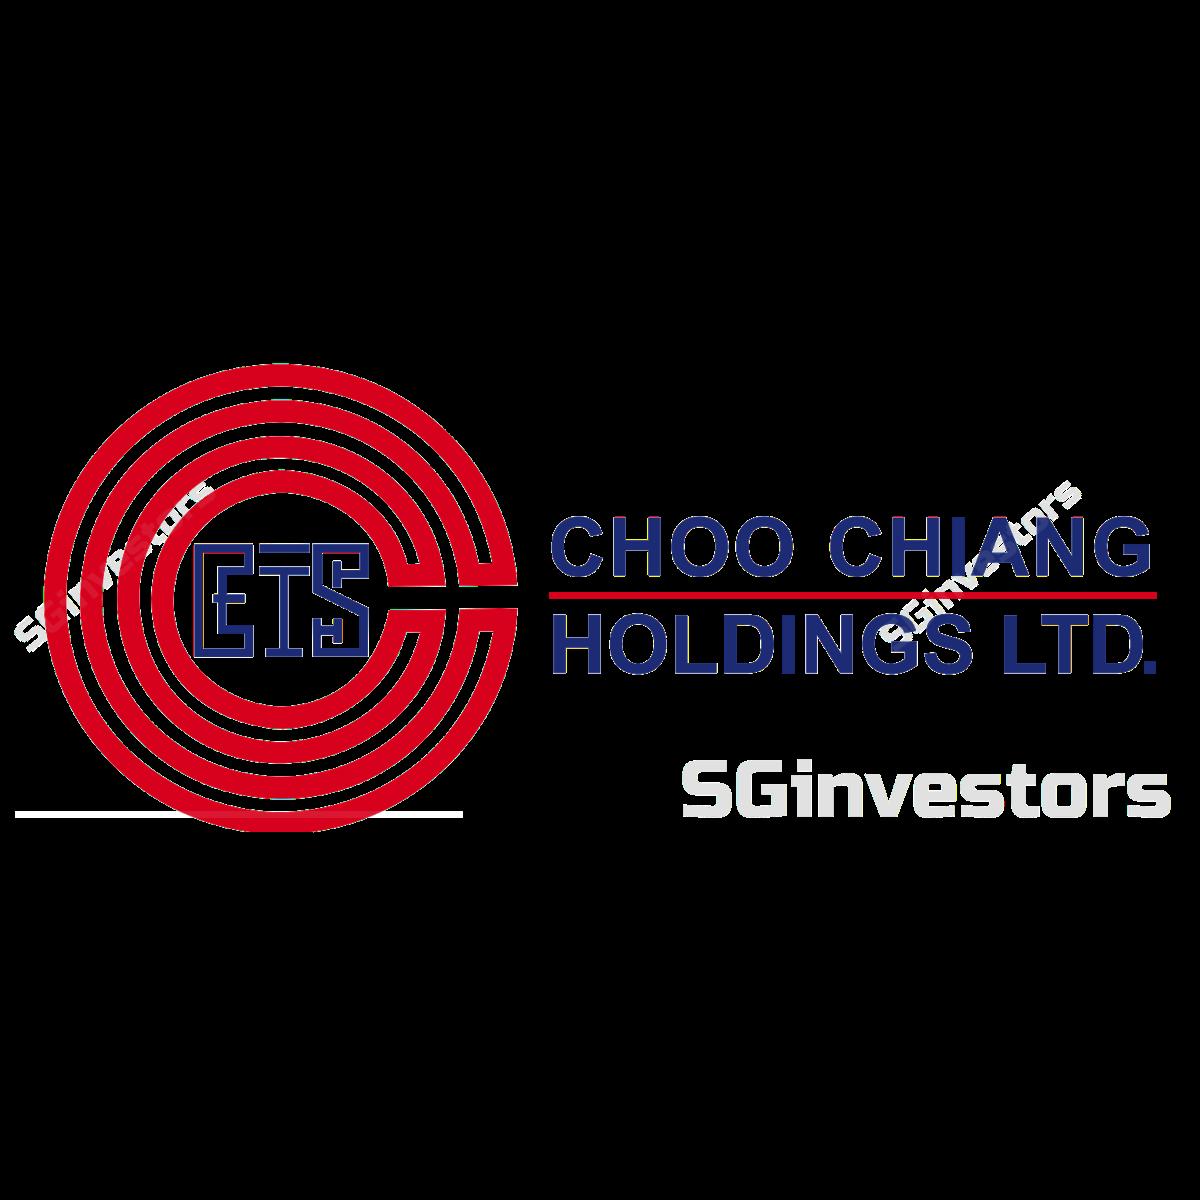 CHOO CHIANG HOLDINGS LTD. (SGX:42E) @ SGinvestors.io